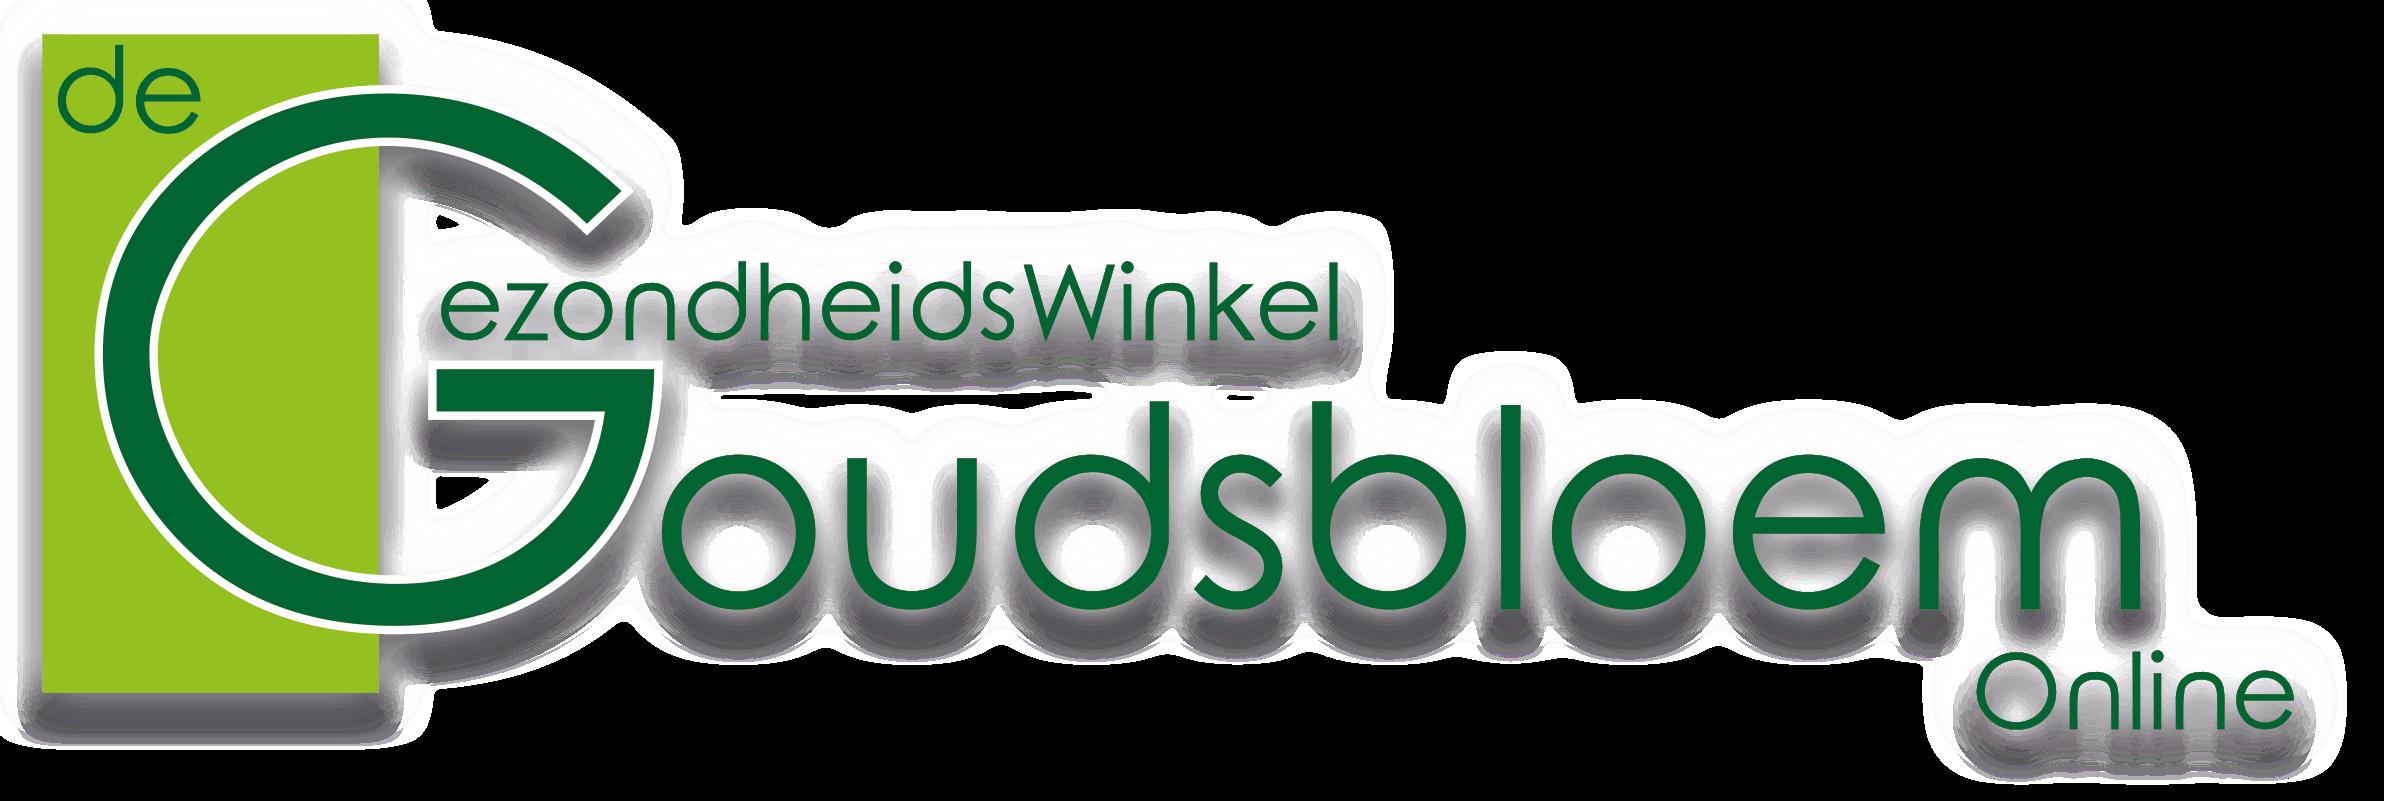 G&W De Goudsbloem